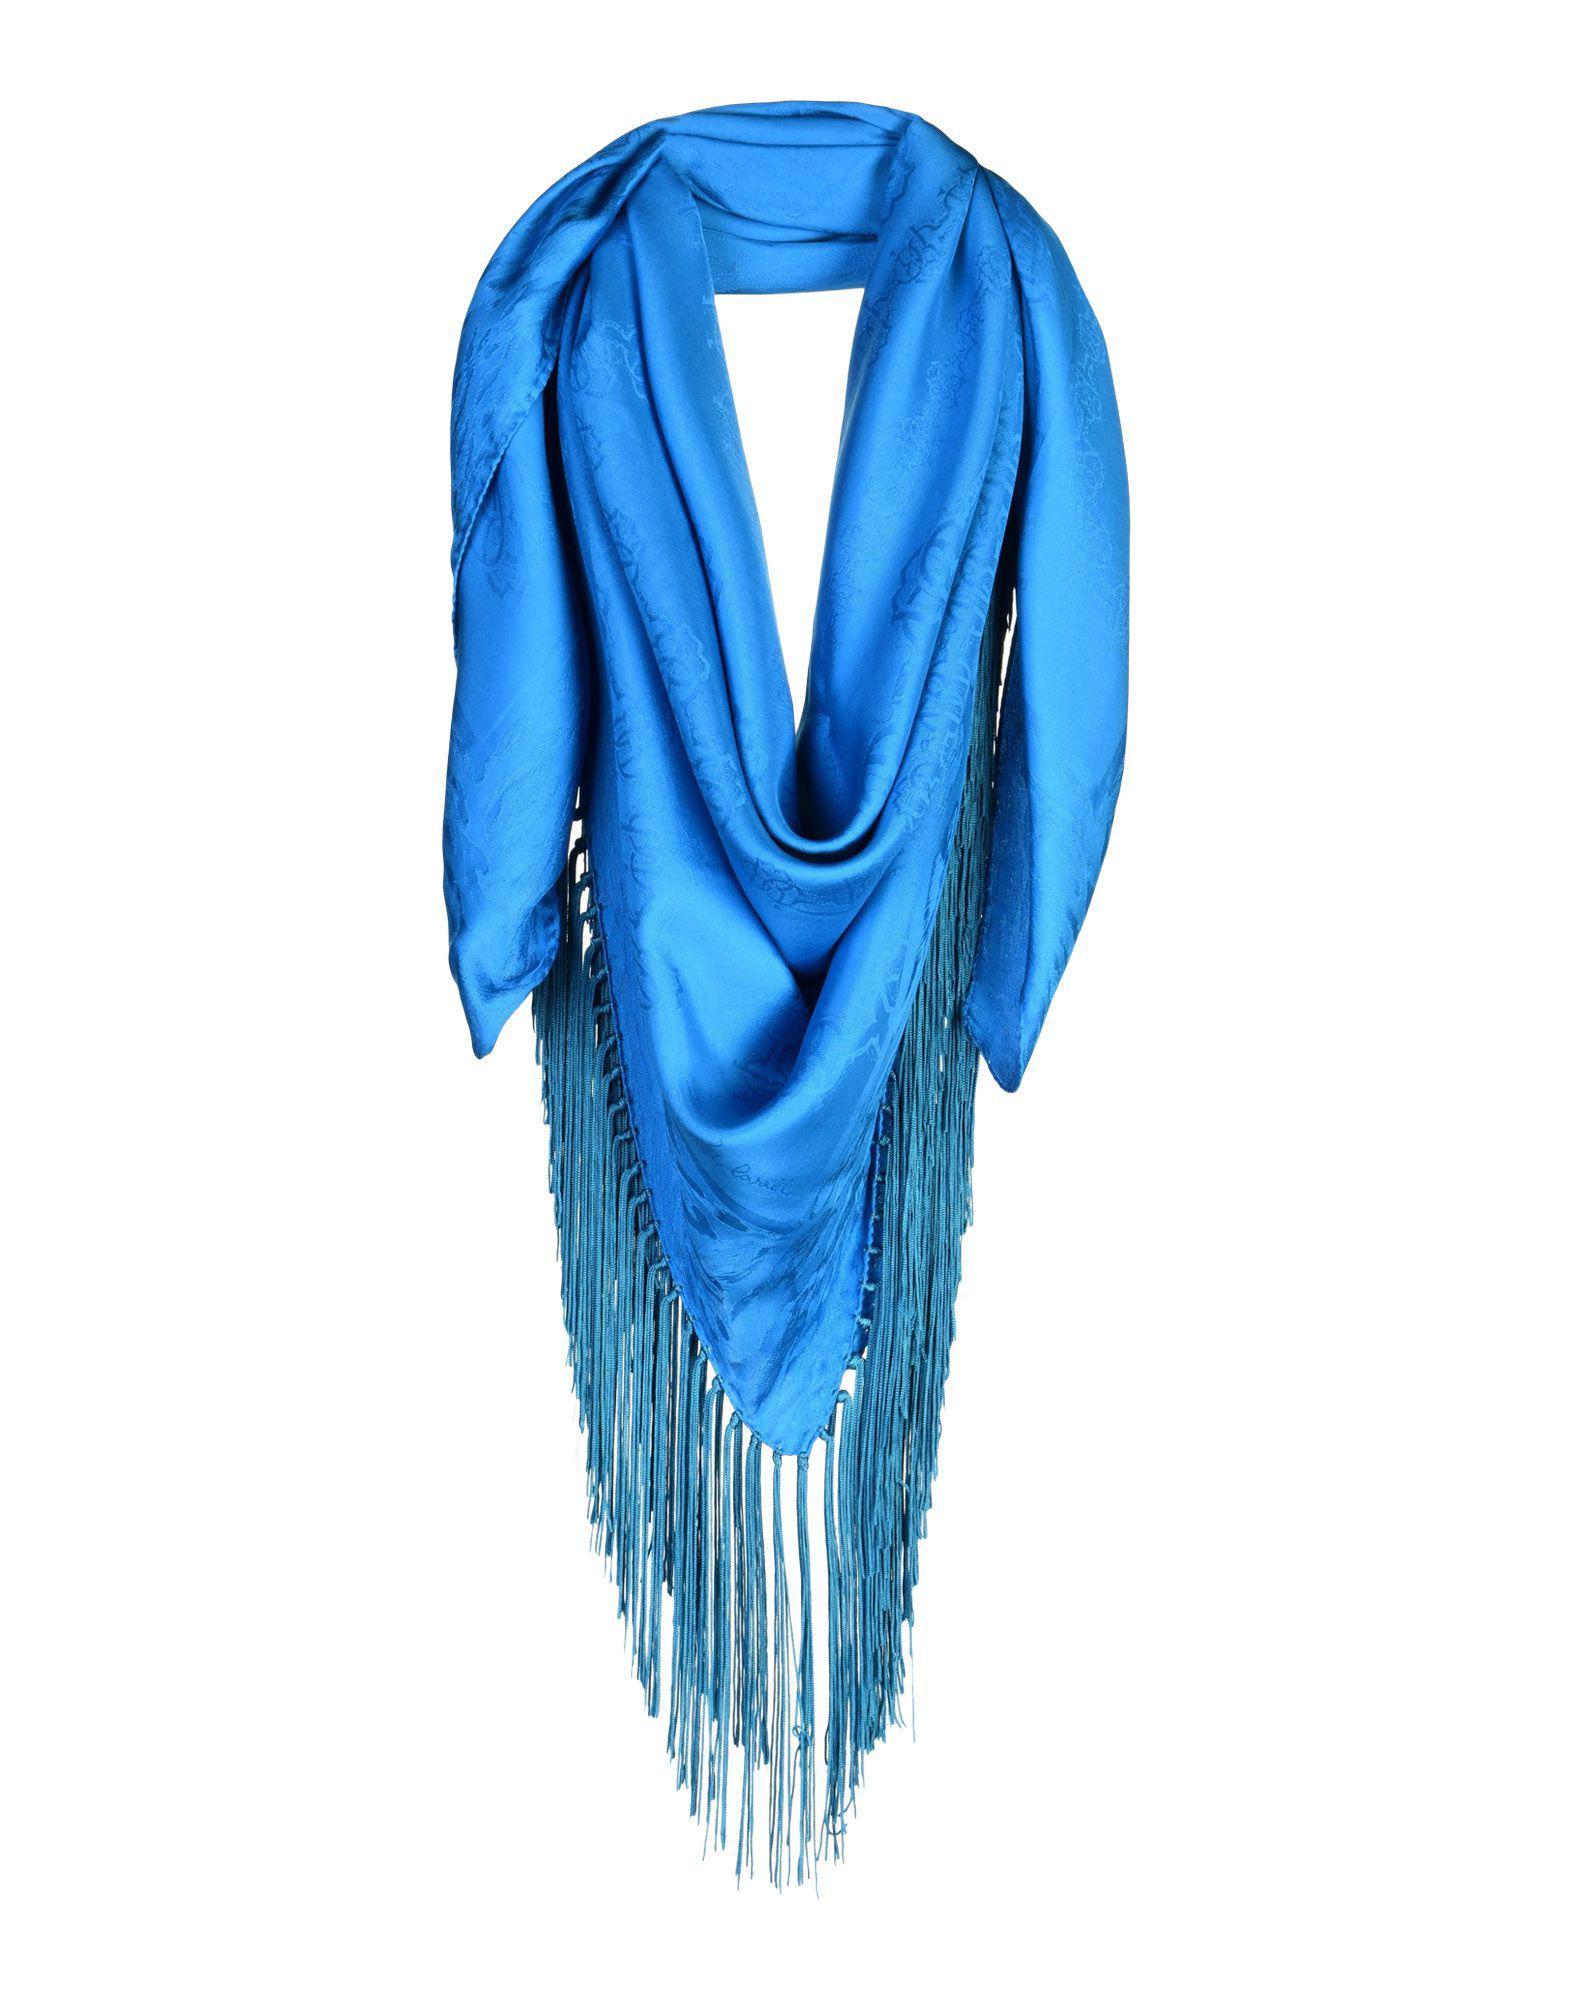 27e7318861e8 Lyst - Foulard Roberto Cavalli en coloris Bleu